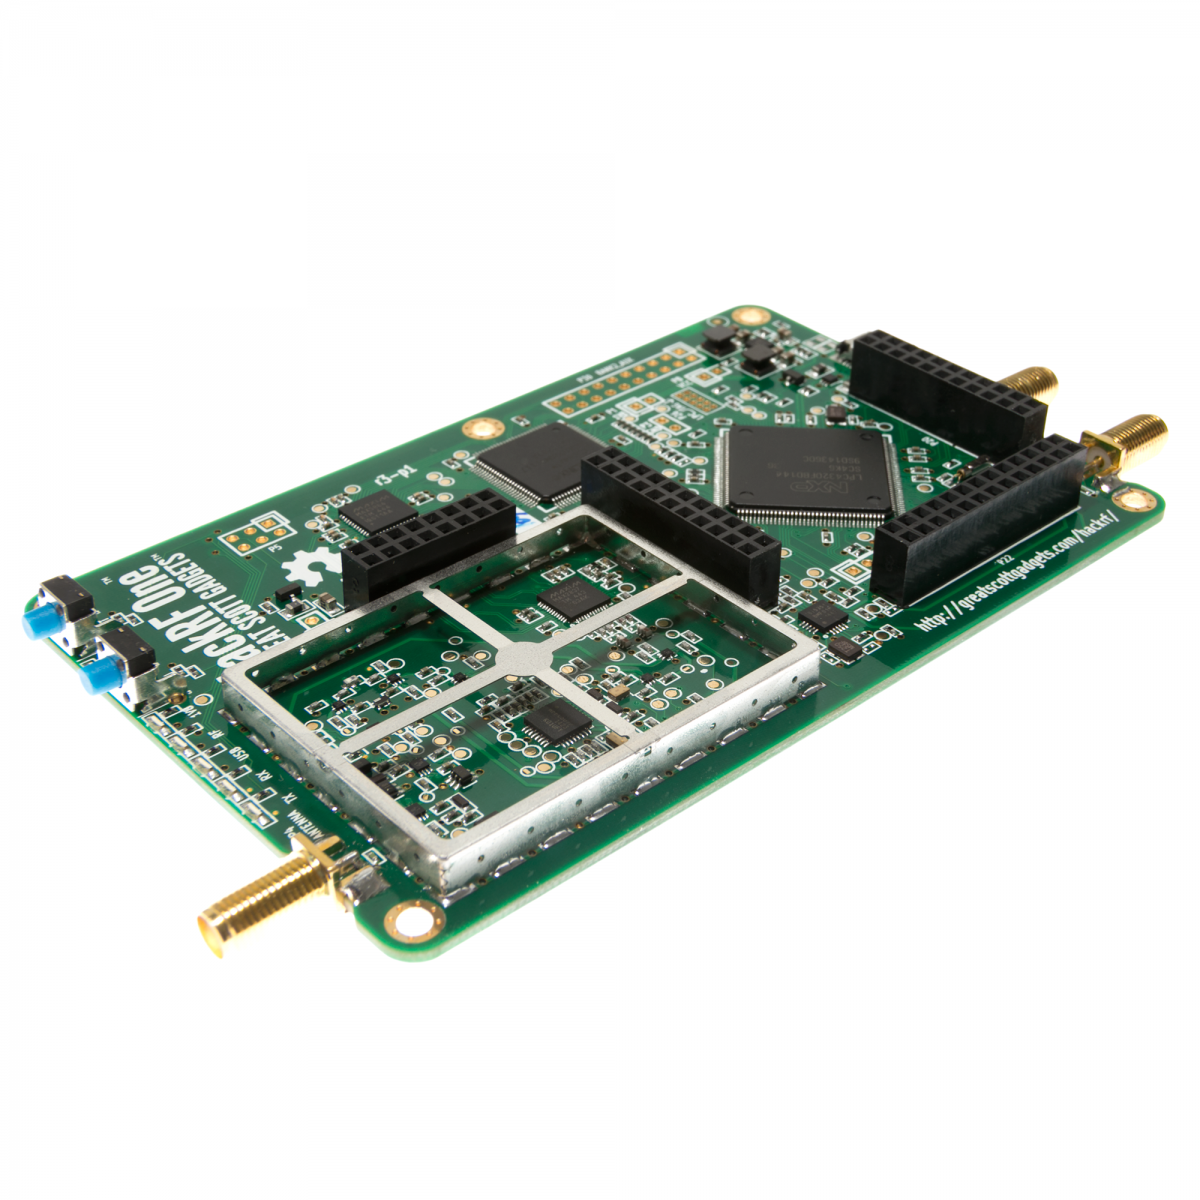 Robosavvy store rf shield component kit for hackrf one